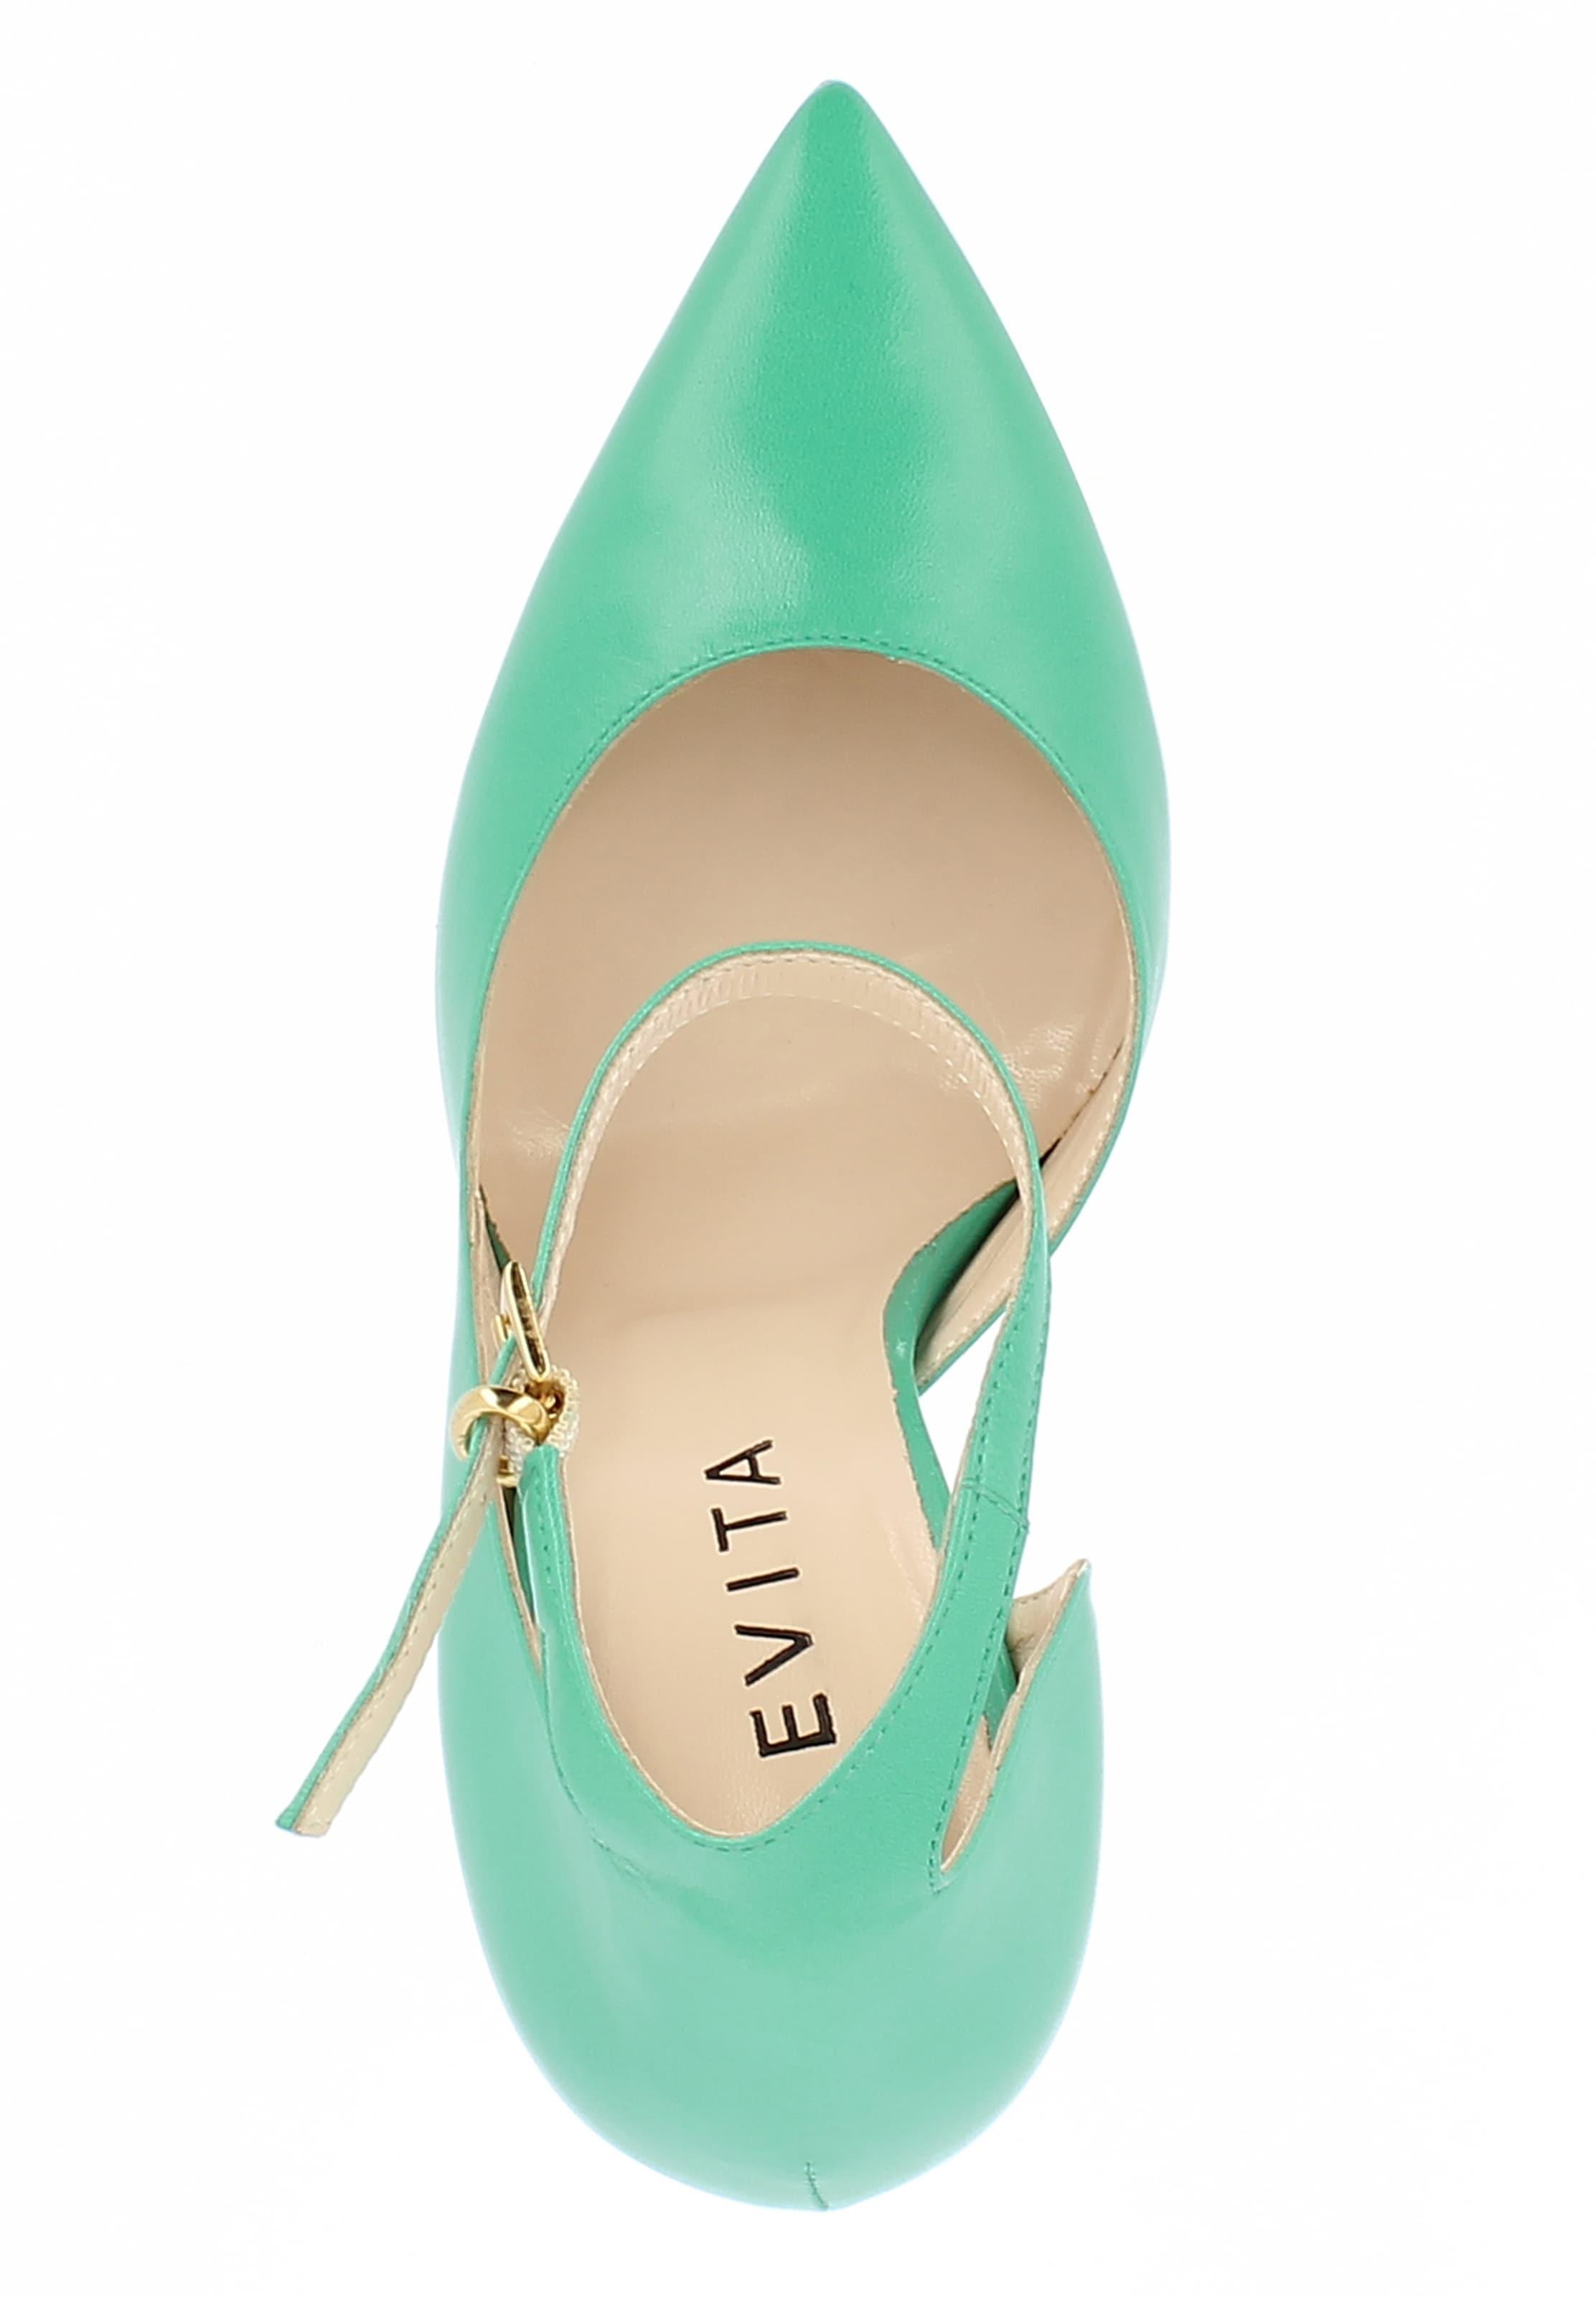 'lisa' Evita Evita En Escarpins En Menthe Escarpins Menthe Evita 'lisa' wvm8PN0Oyn